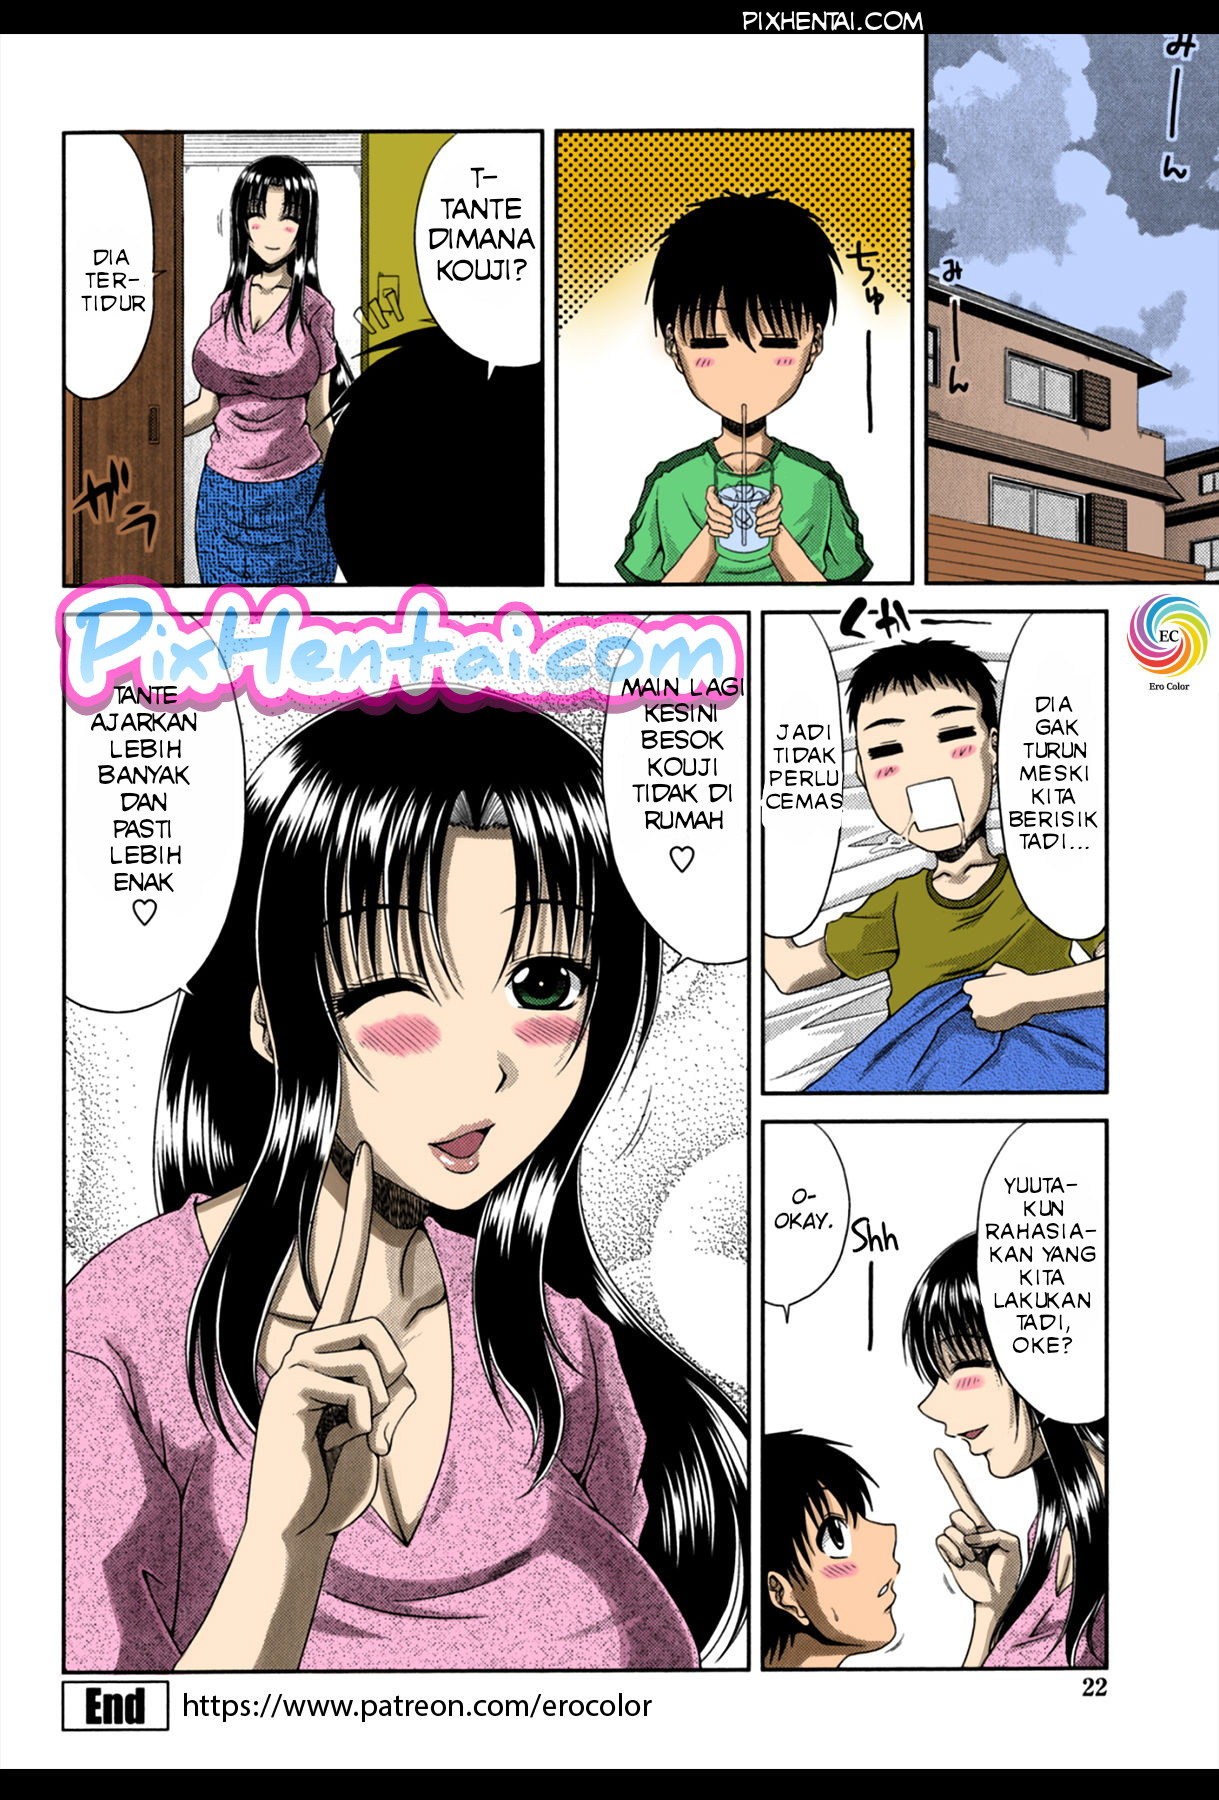 Komik Hentai Mandi dengan Ibunya Teman yang Bohai Manga Sex Porn Doujin XXX Bokep 21